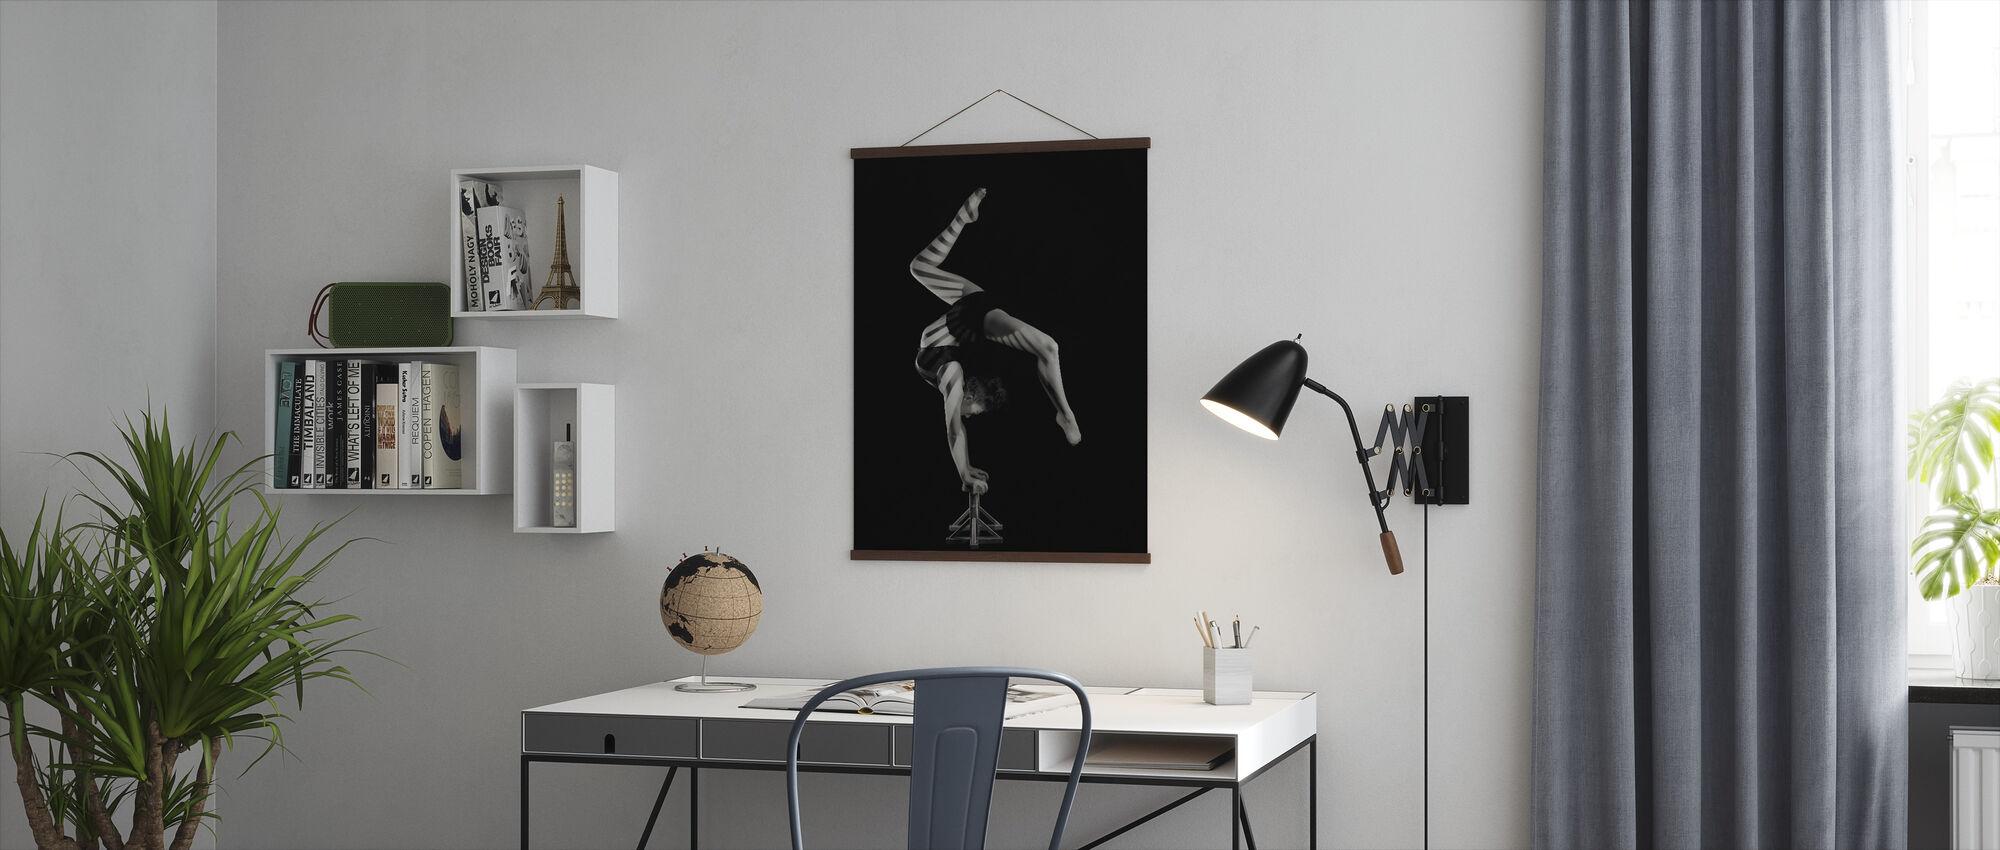 Paski - Plakat - Biuro